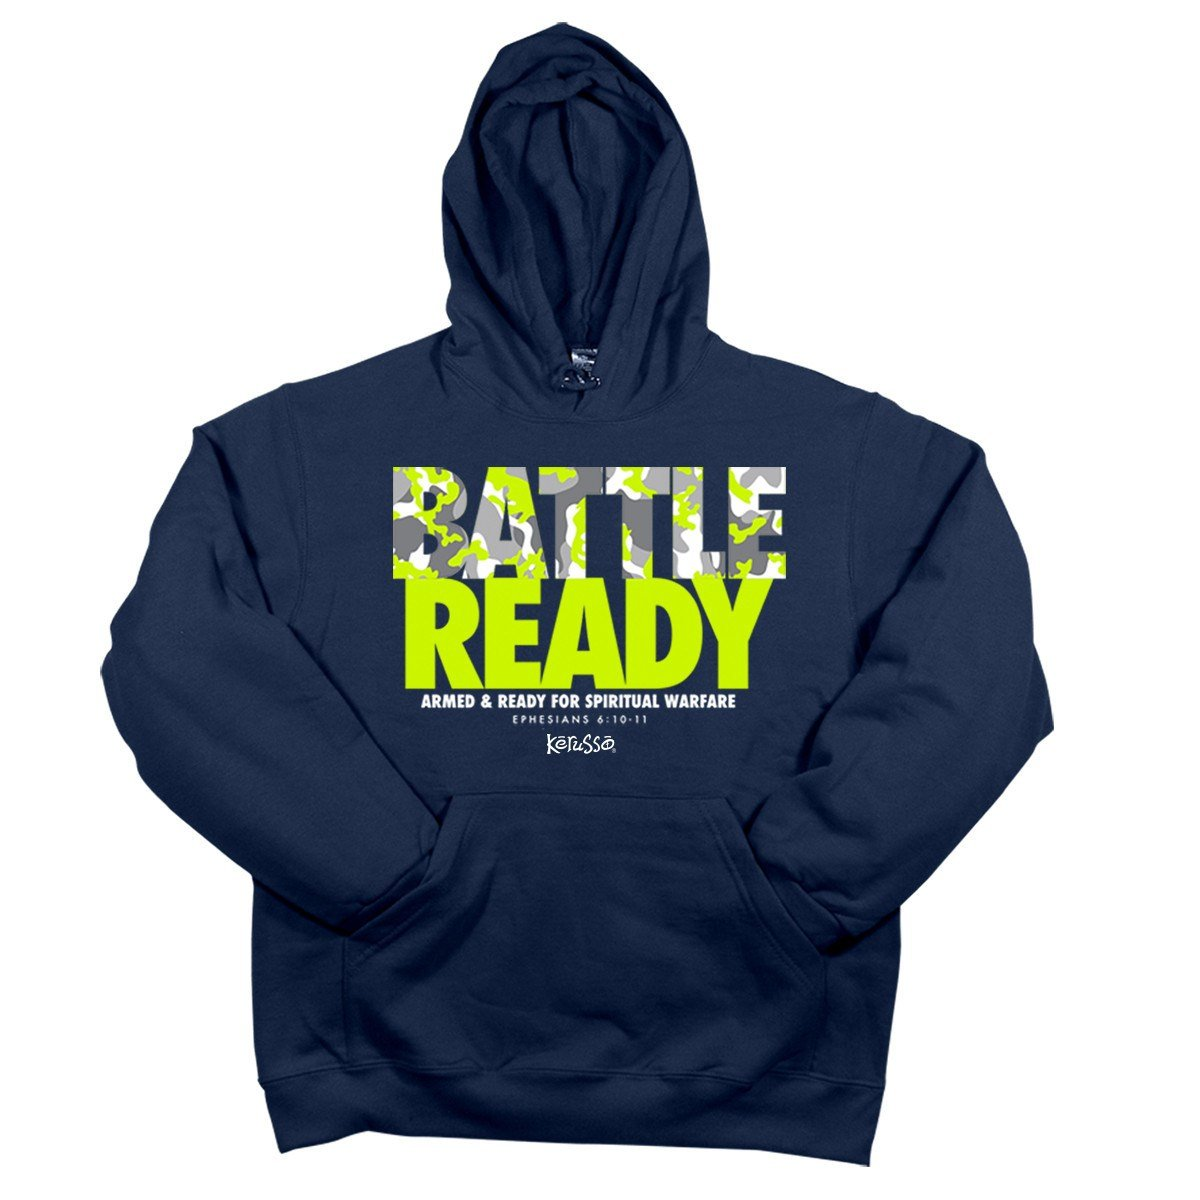 Battle Ready, Hooded Sweat, LG, Navy - Christian Fashion Gifts